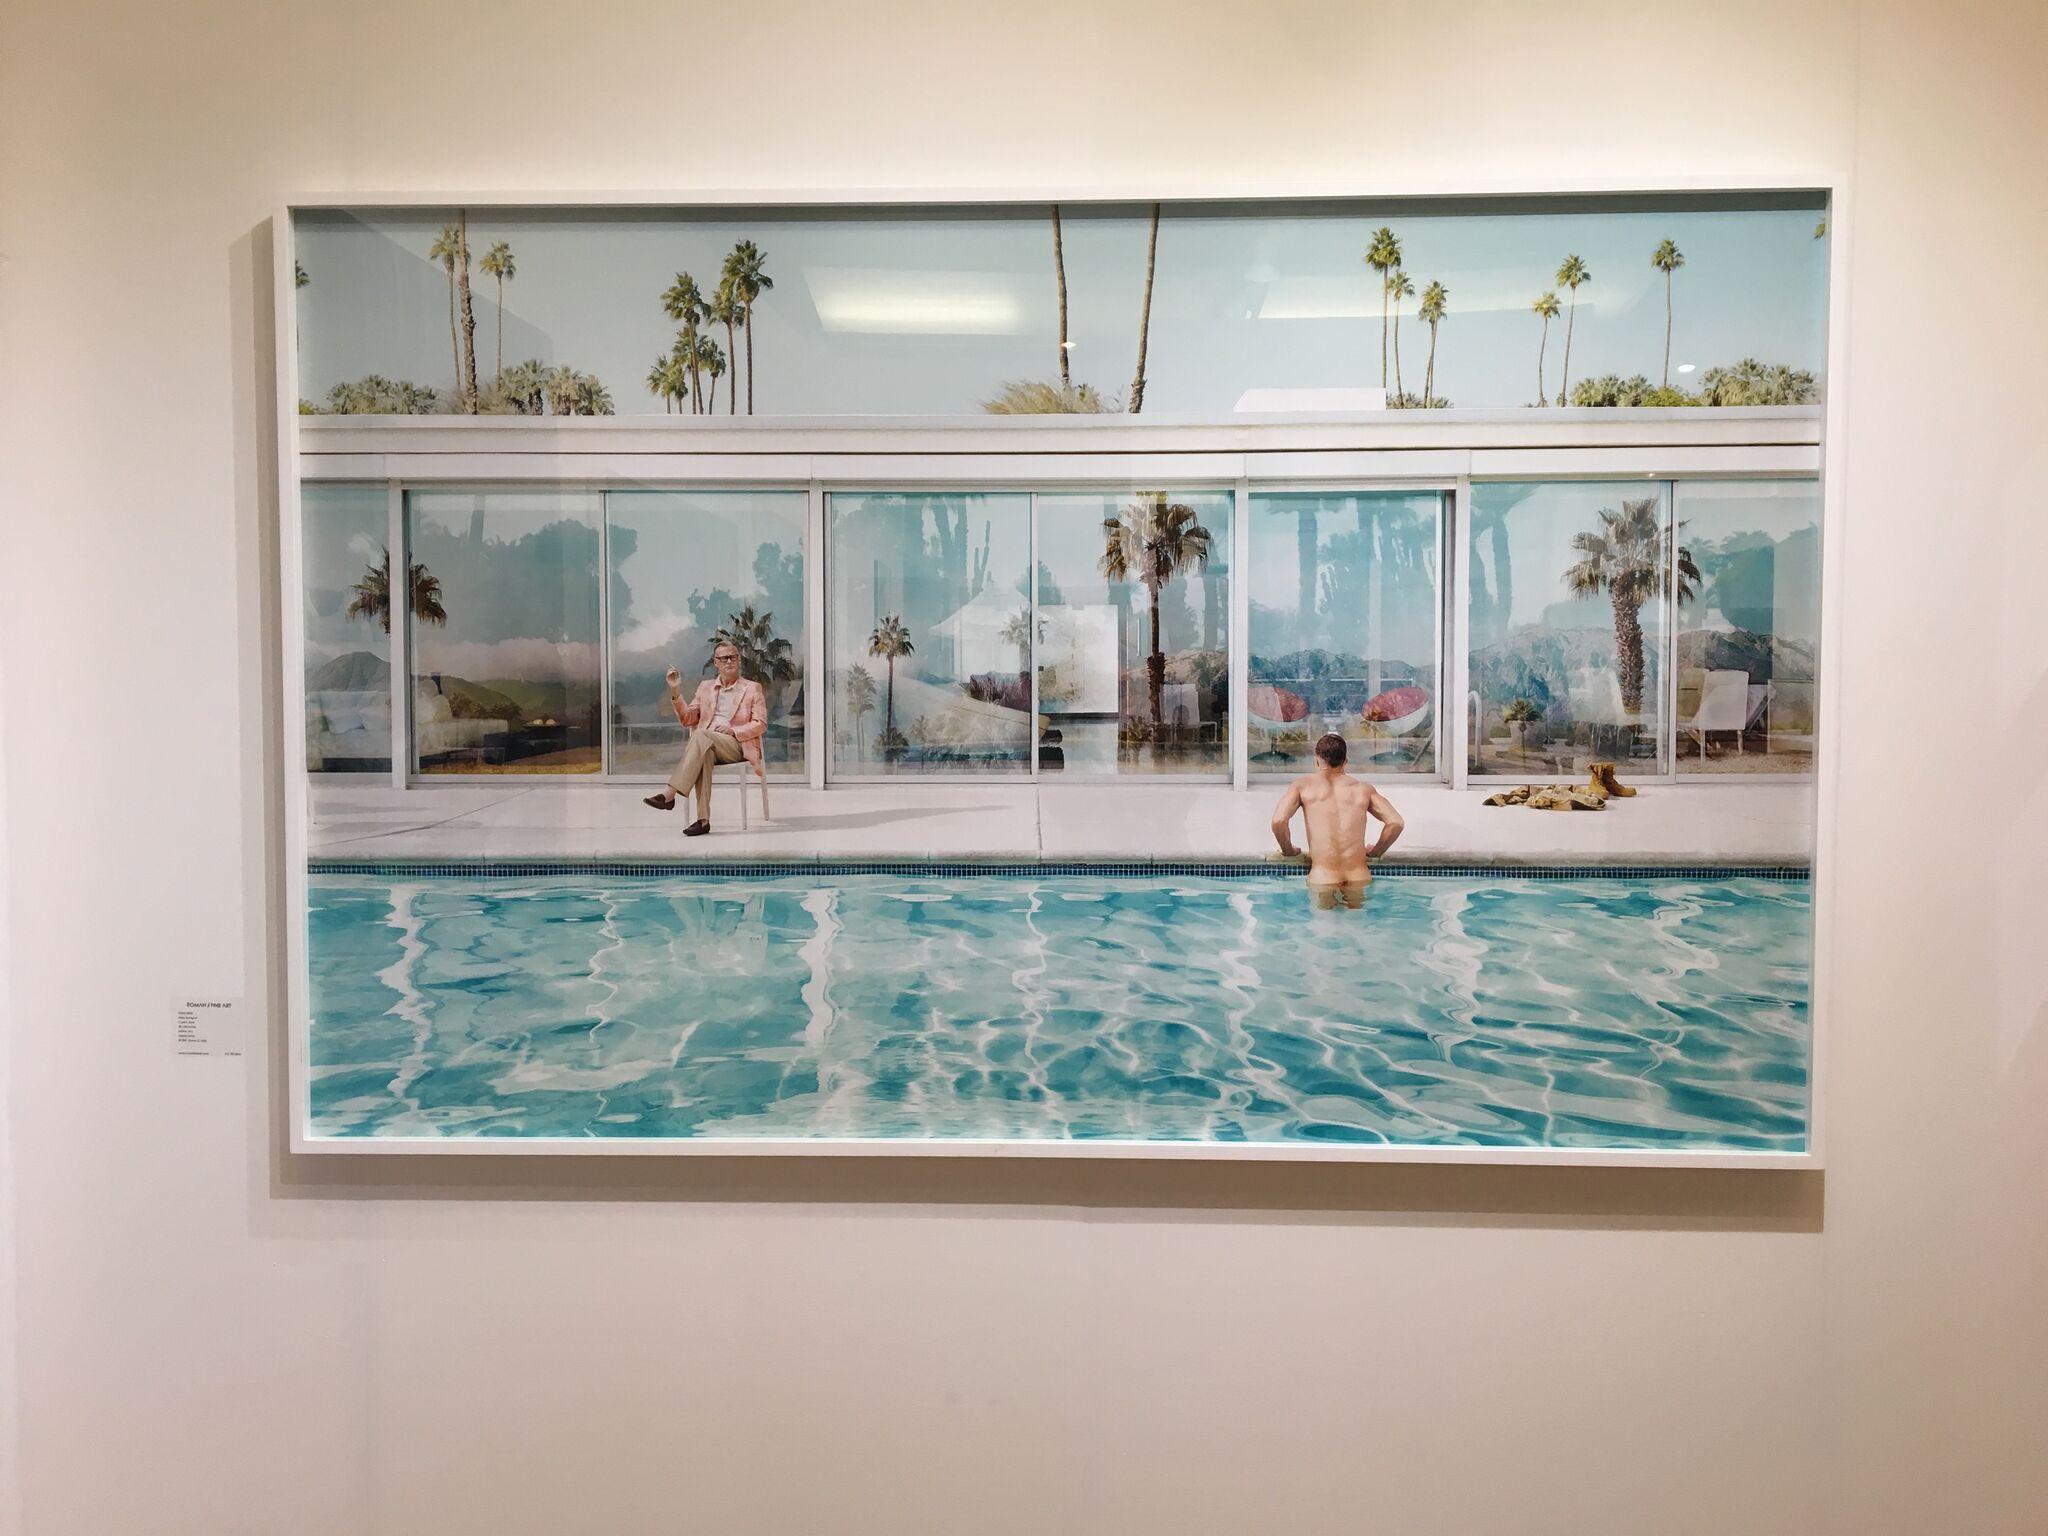 Palm Springs II by Dean West